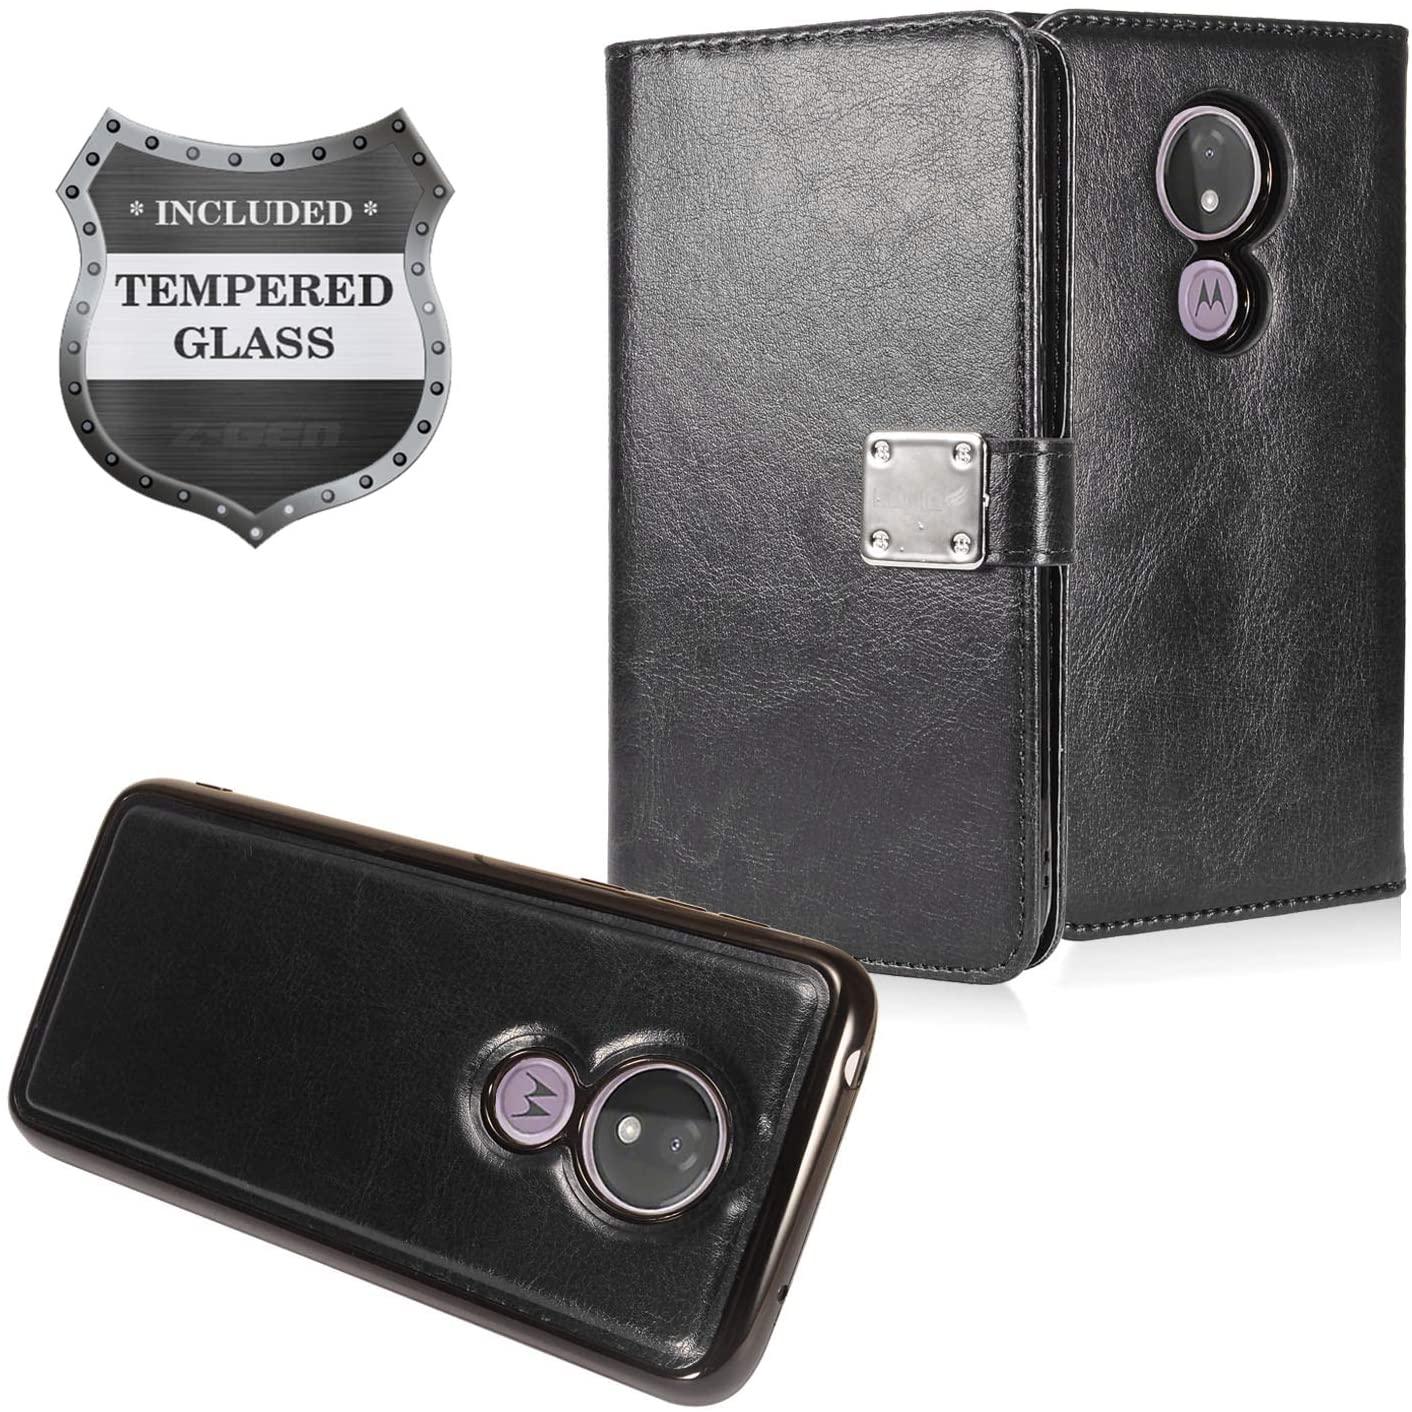 Z-GEN - Motorola Moto G7 Power (U.S. Version), G7 Supra XT1955 - Detachable Magnetic Flip Wallet Phone Case + Tempered Glass Screen Protector - MW2 Black